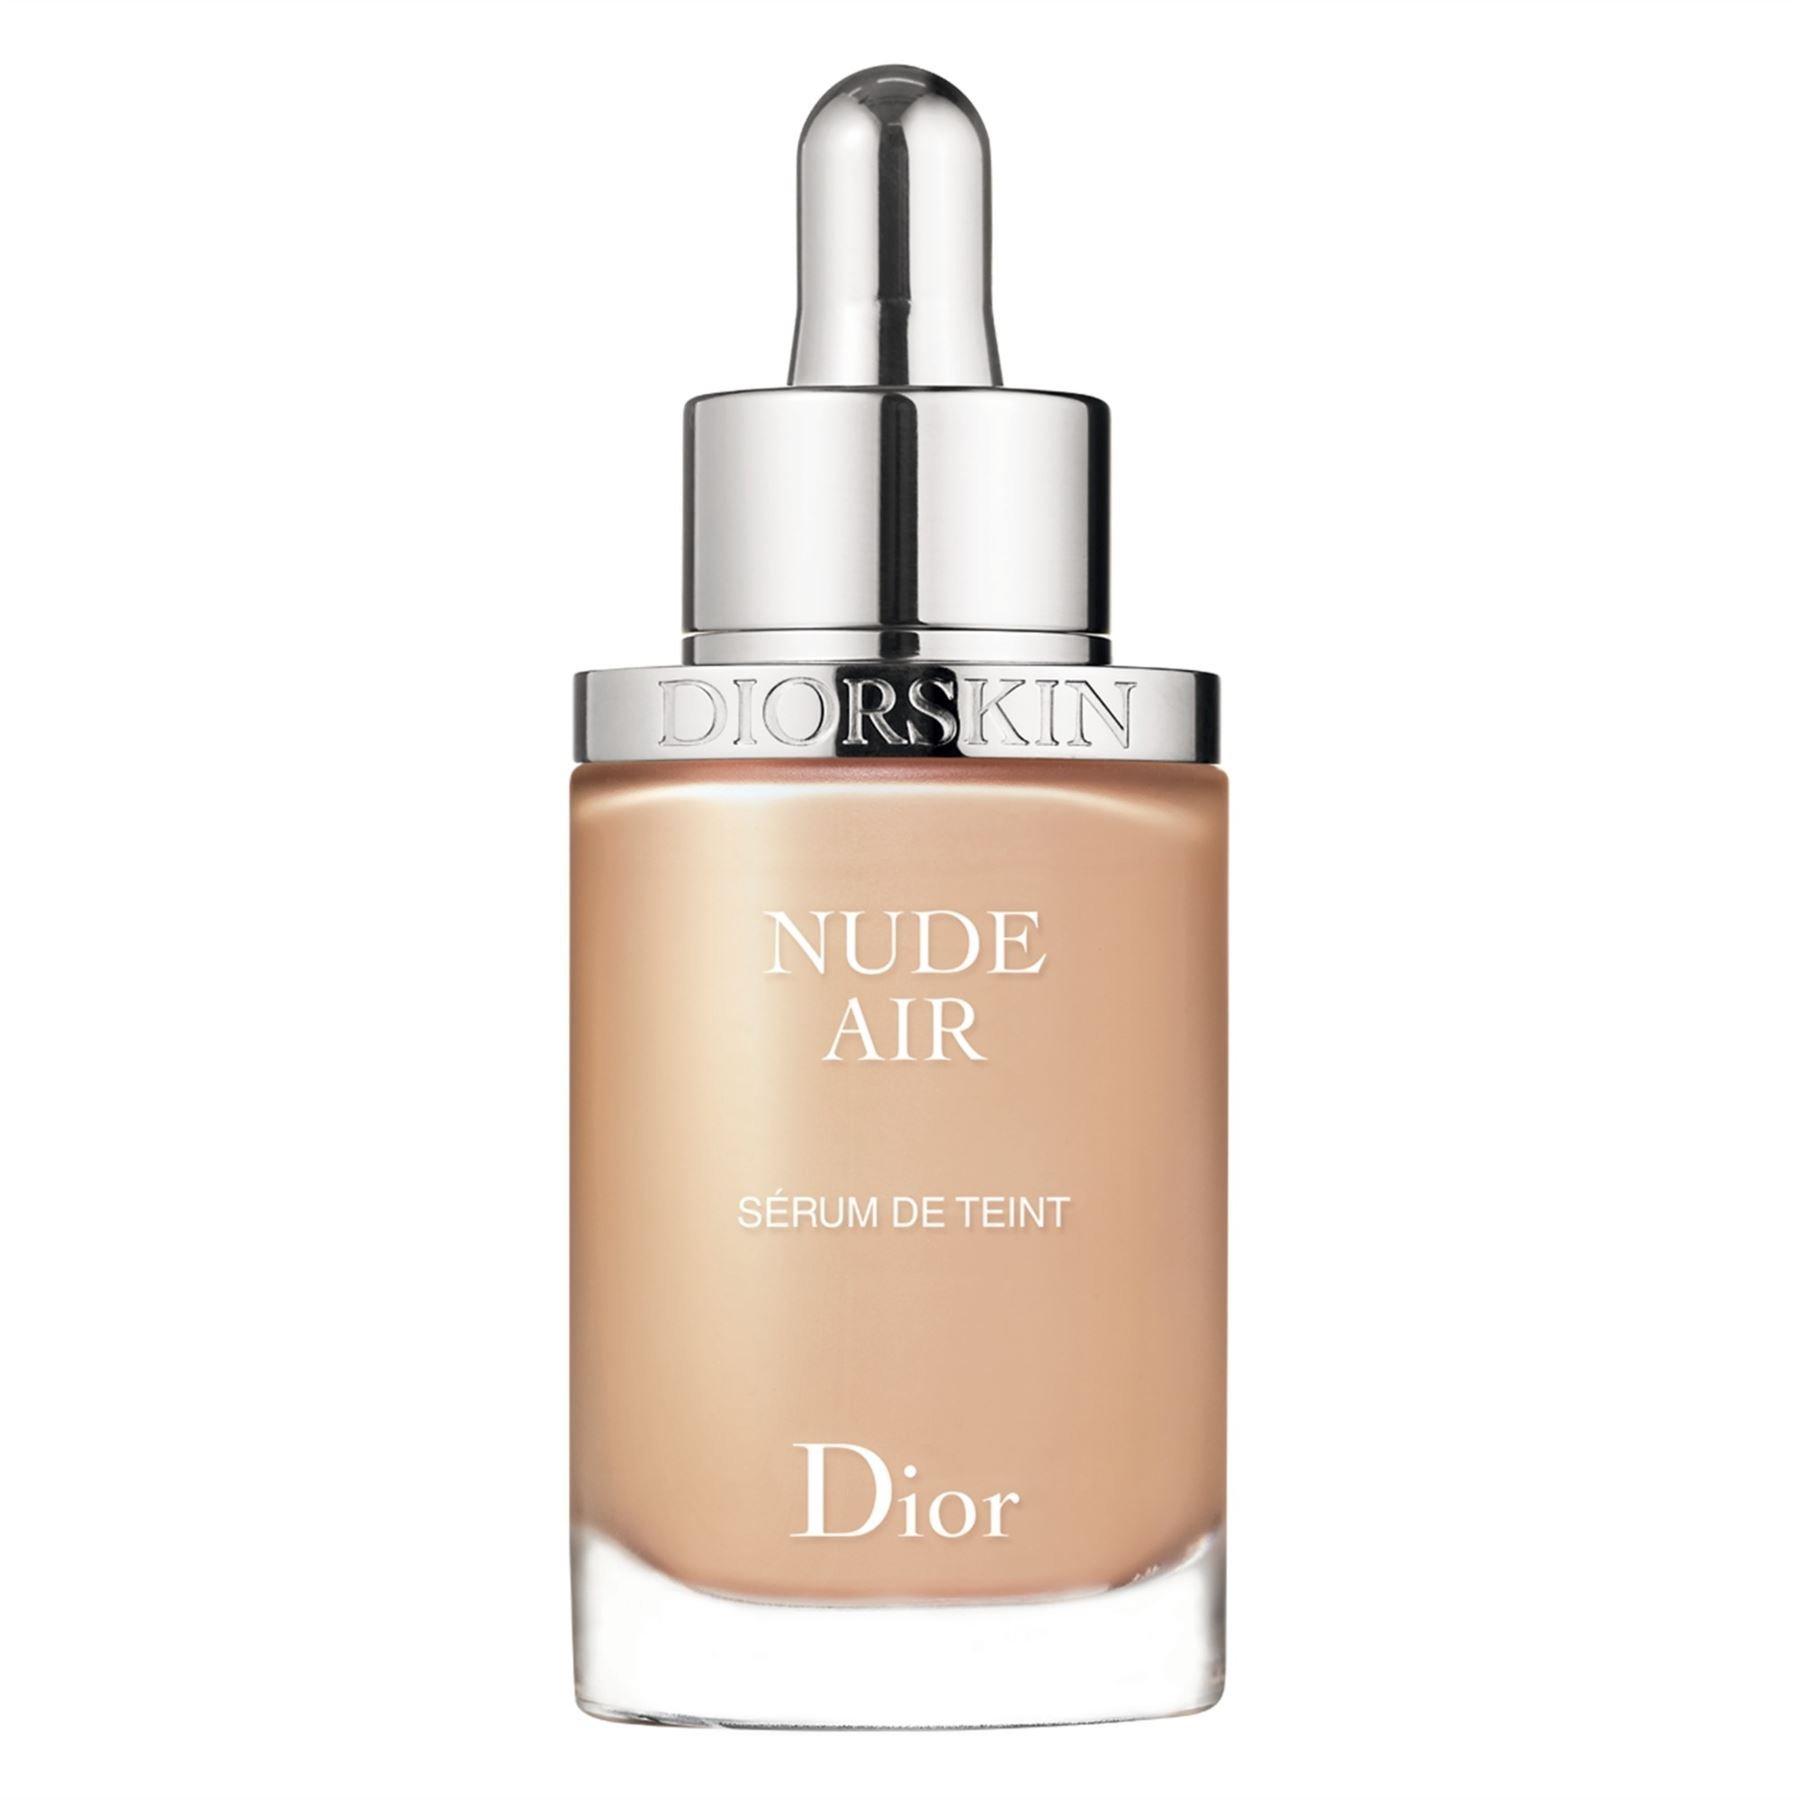 Dior Diorskin Nude Air Fluid Foundation 020 Light Beige - Pack of 2